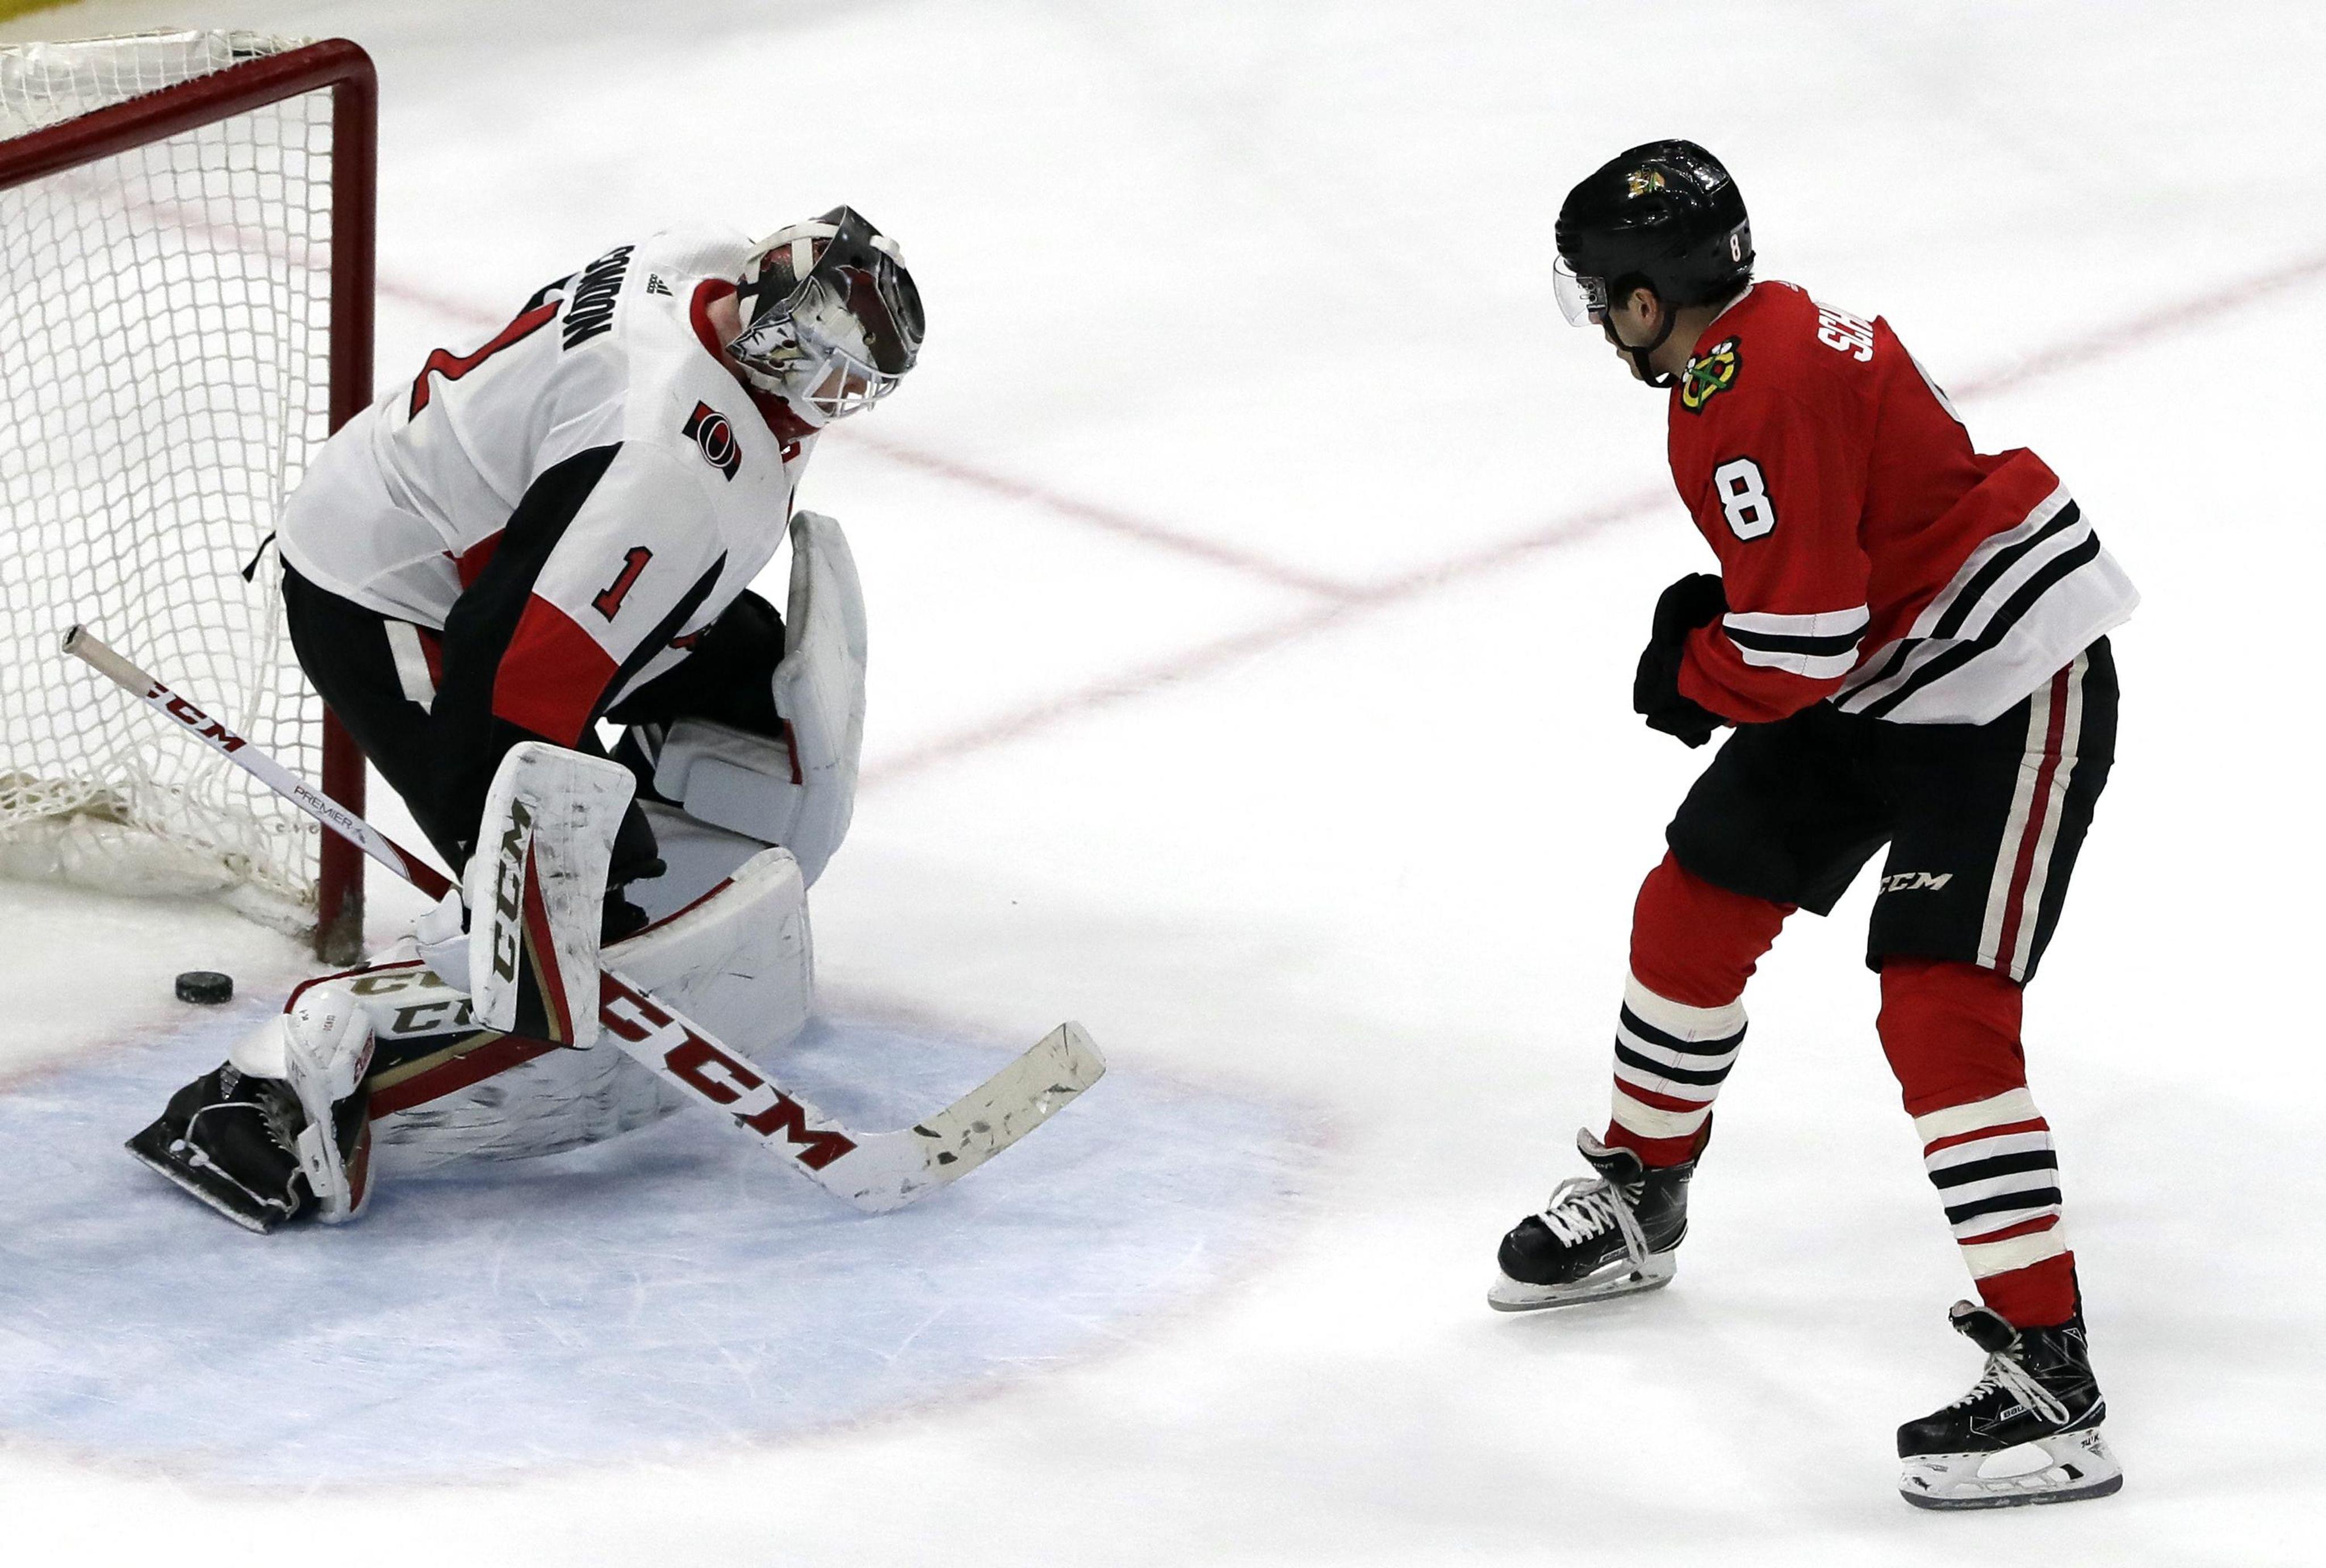 Senators_blackhawks_hockey_12755_s4096x2761